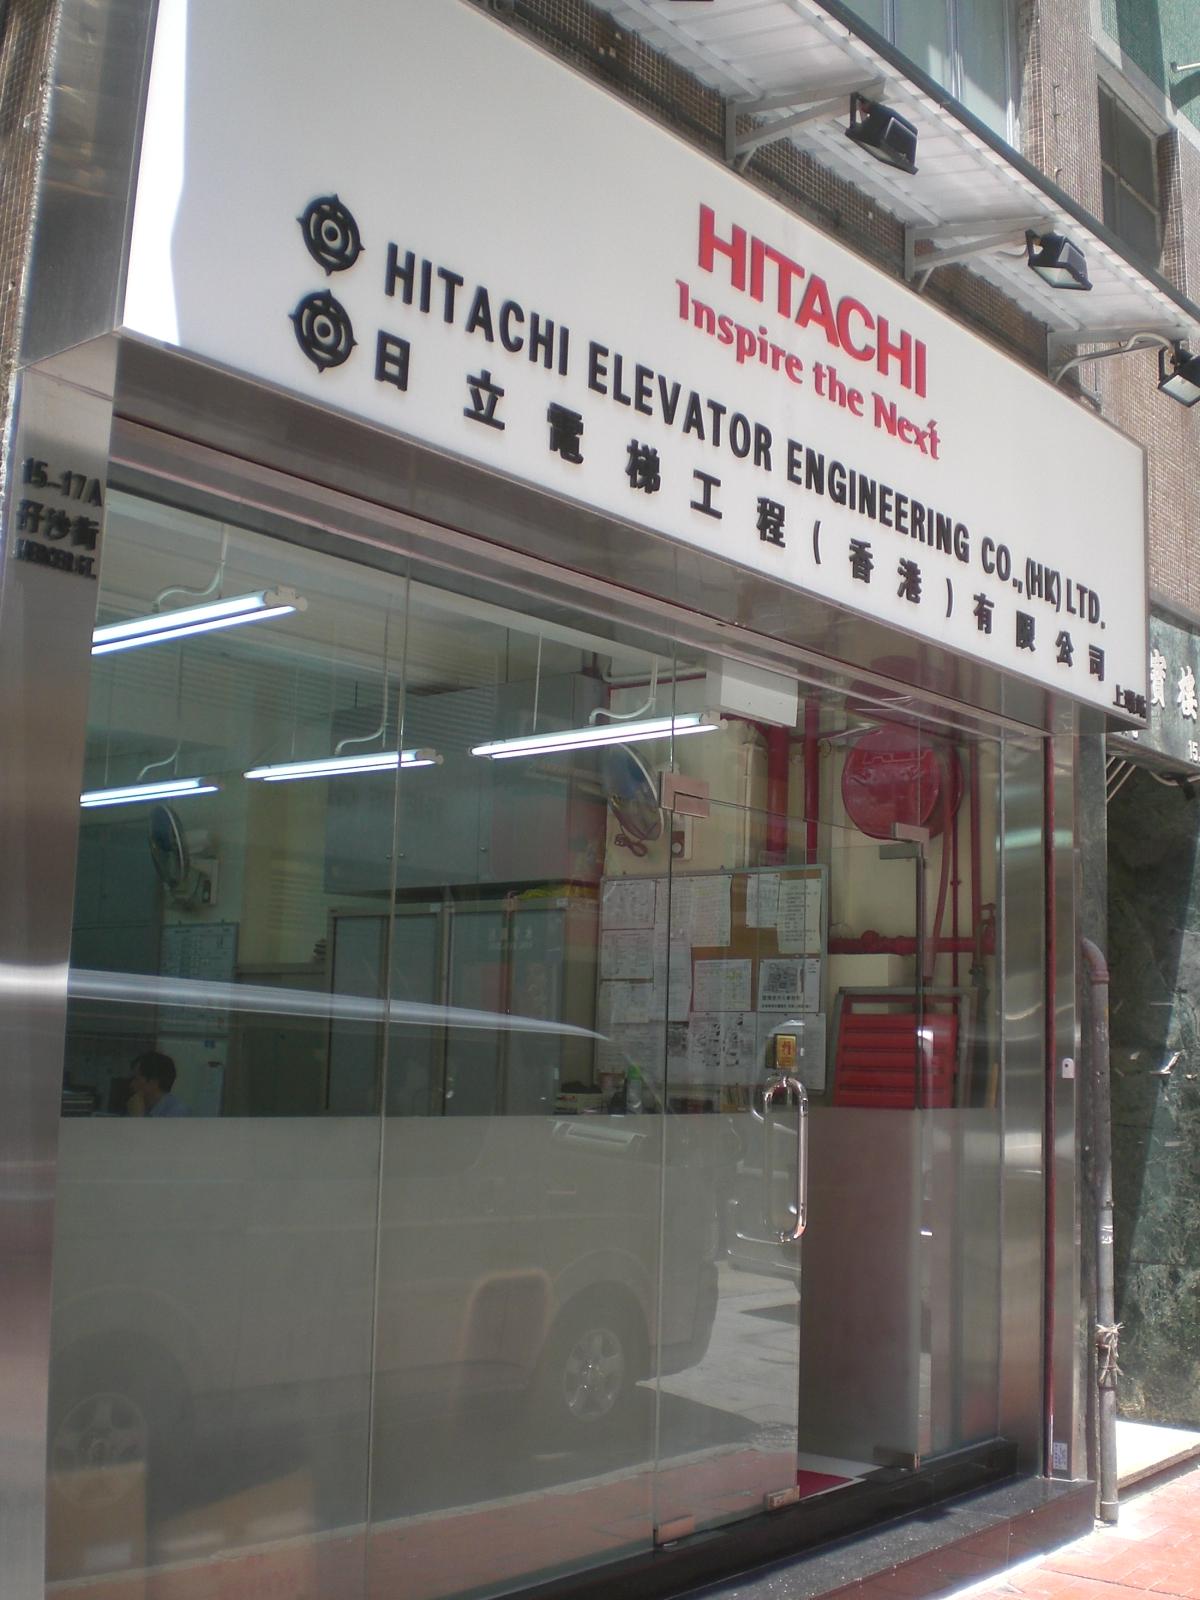 File:HK Sheung Wan Mercer Street Hitachi Elevator